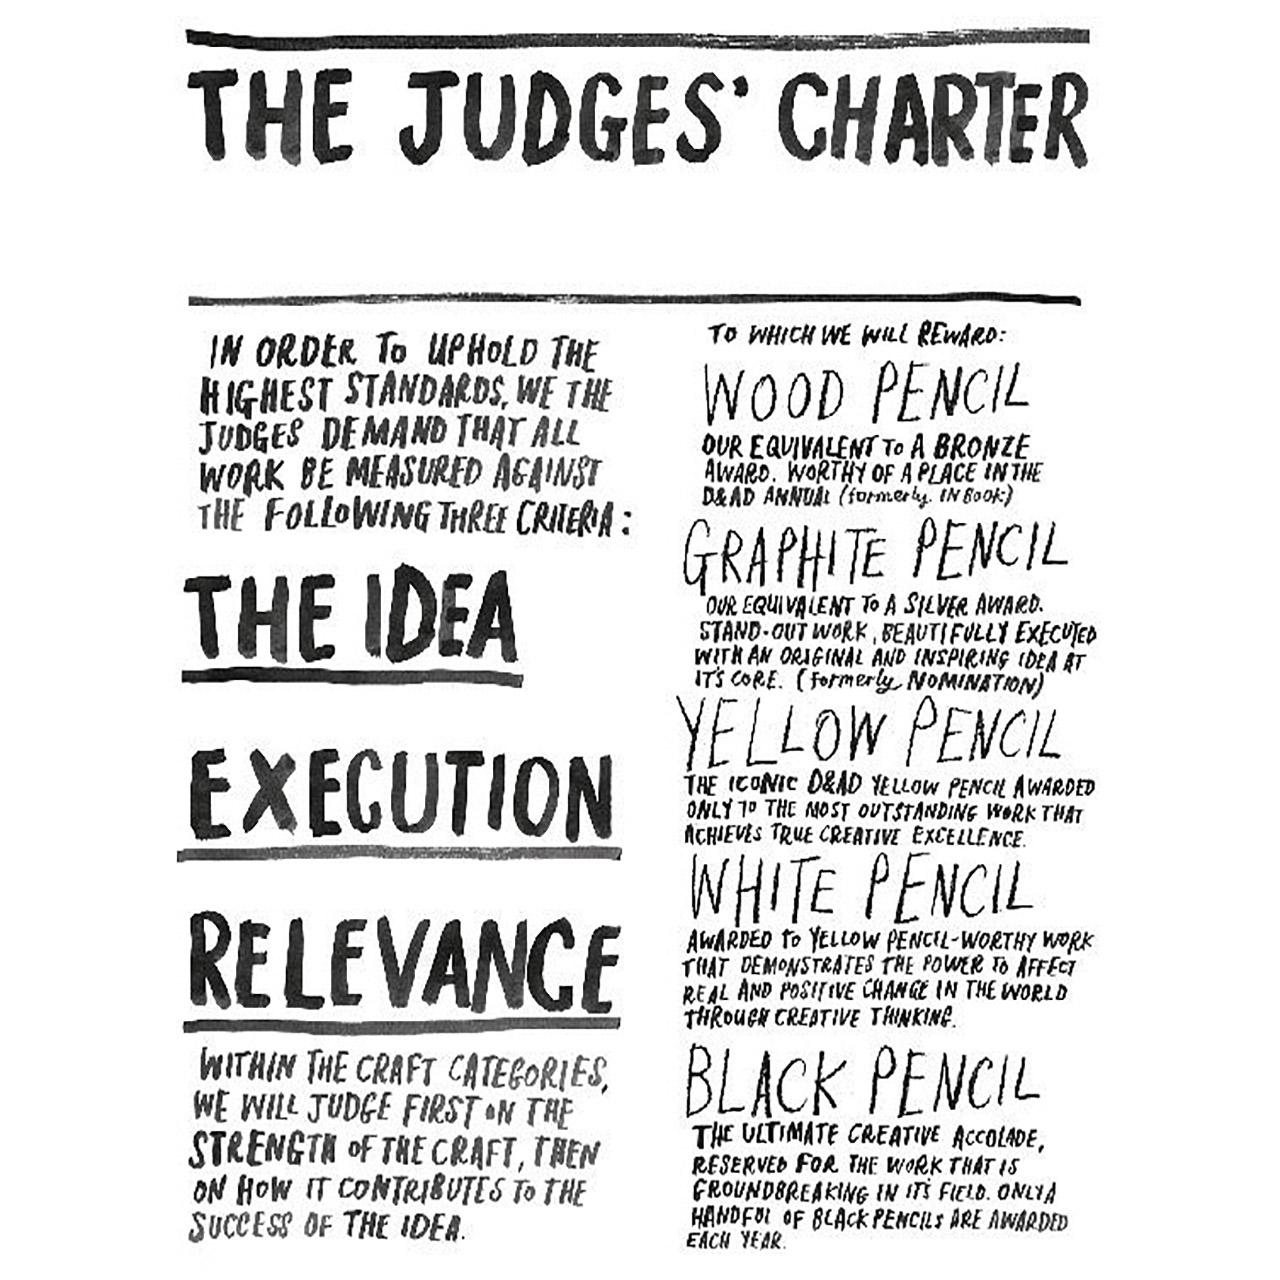 Dad Judgingweek Charter 4